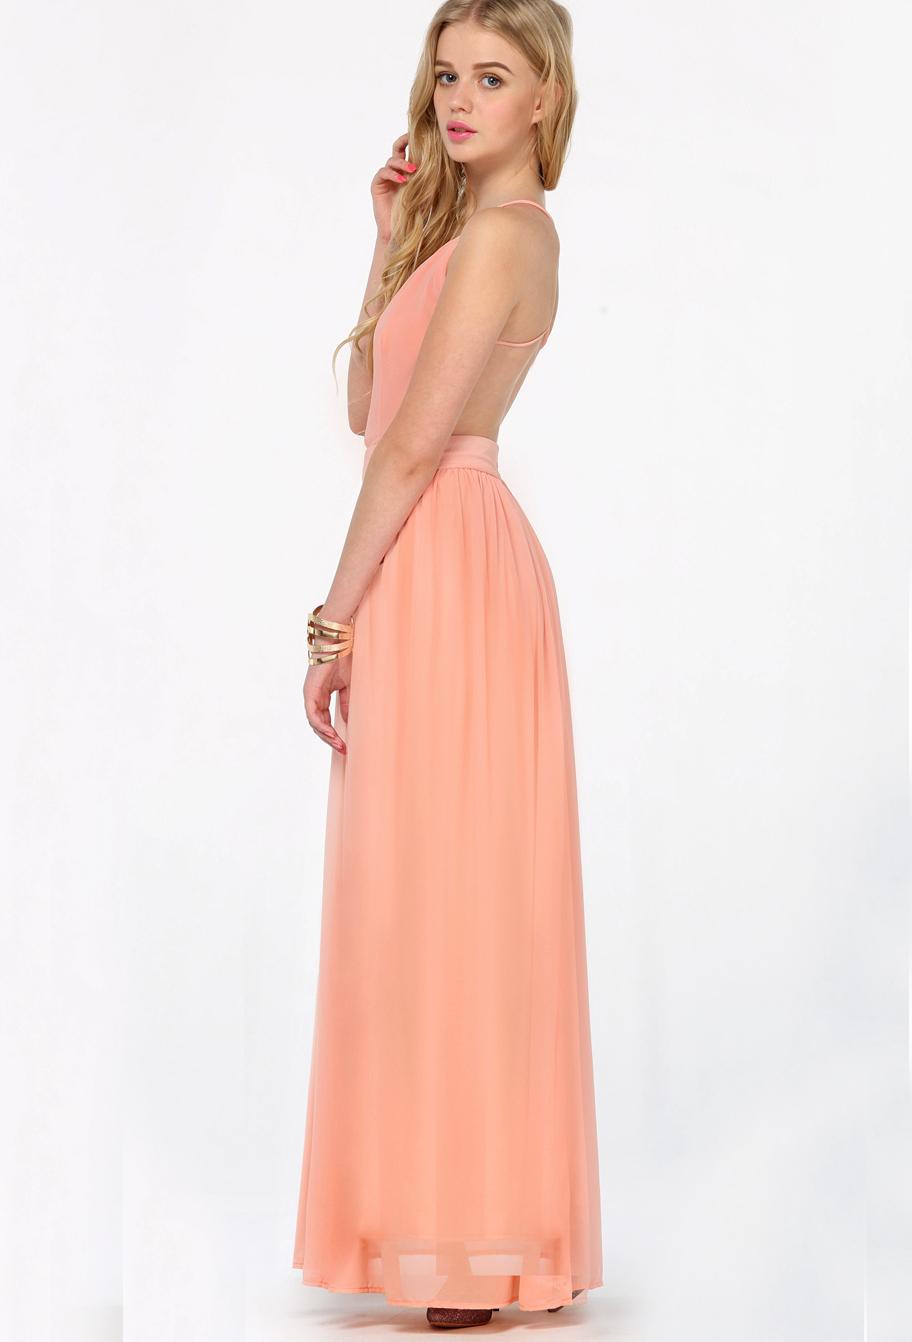 Peach maxi dress wedding